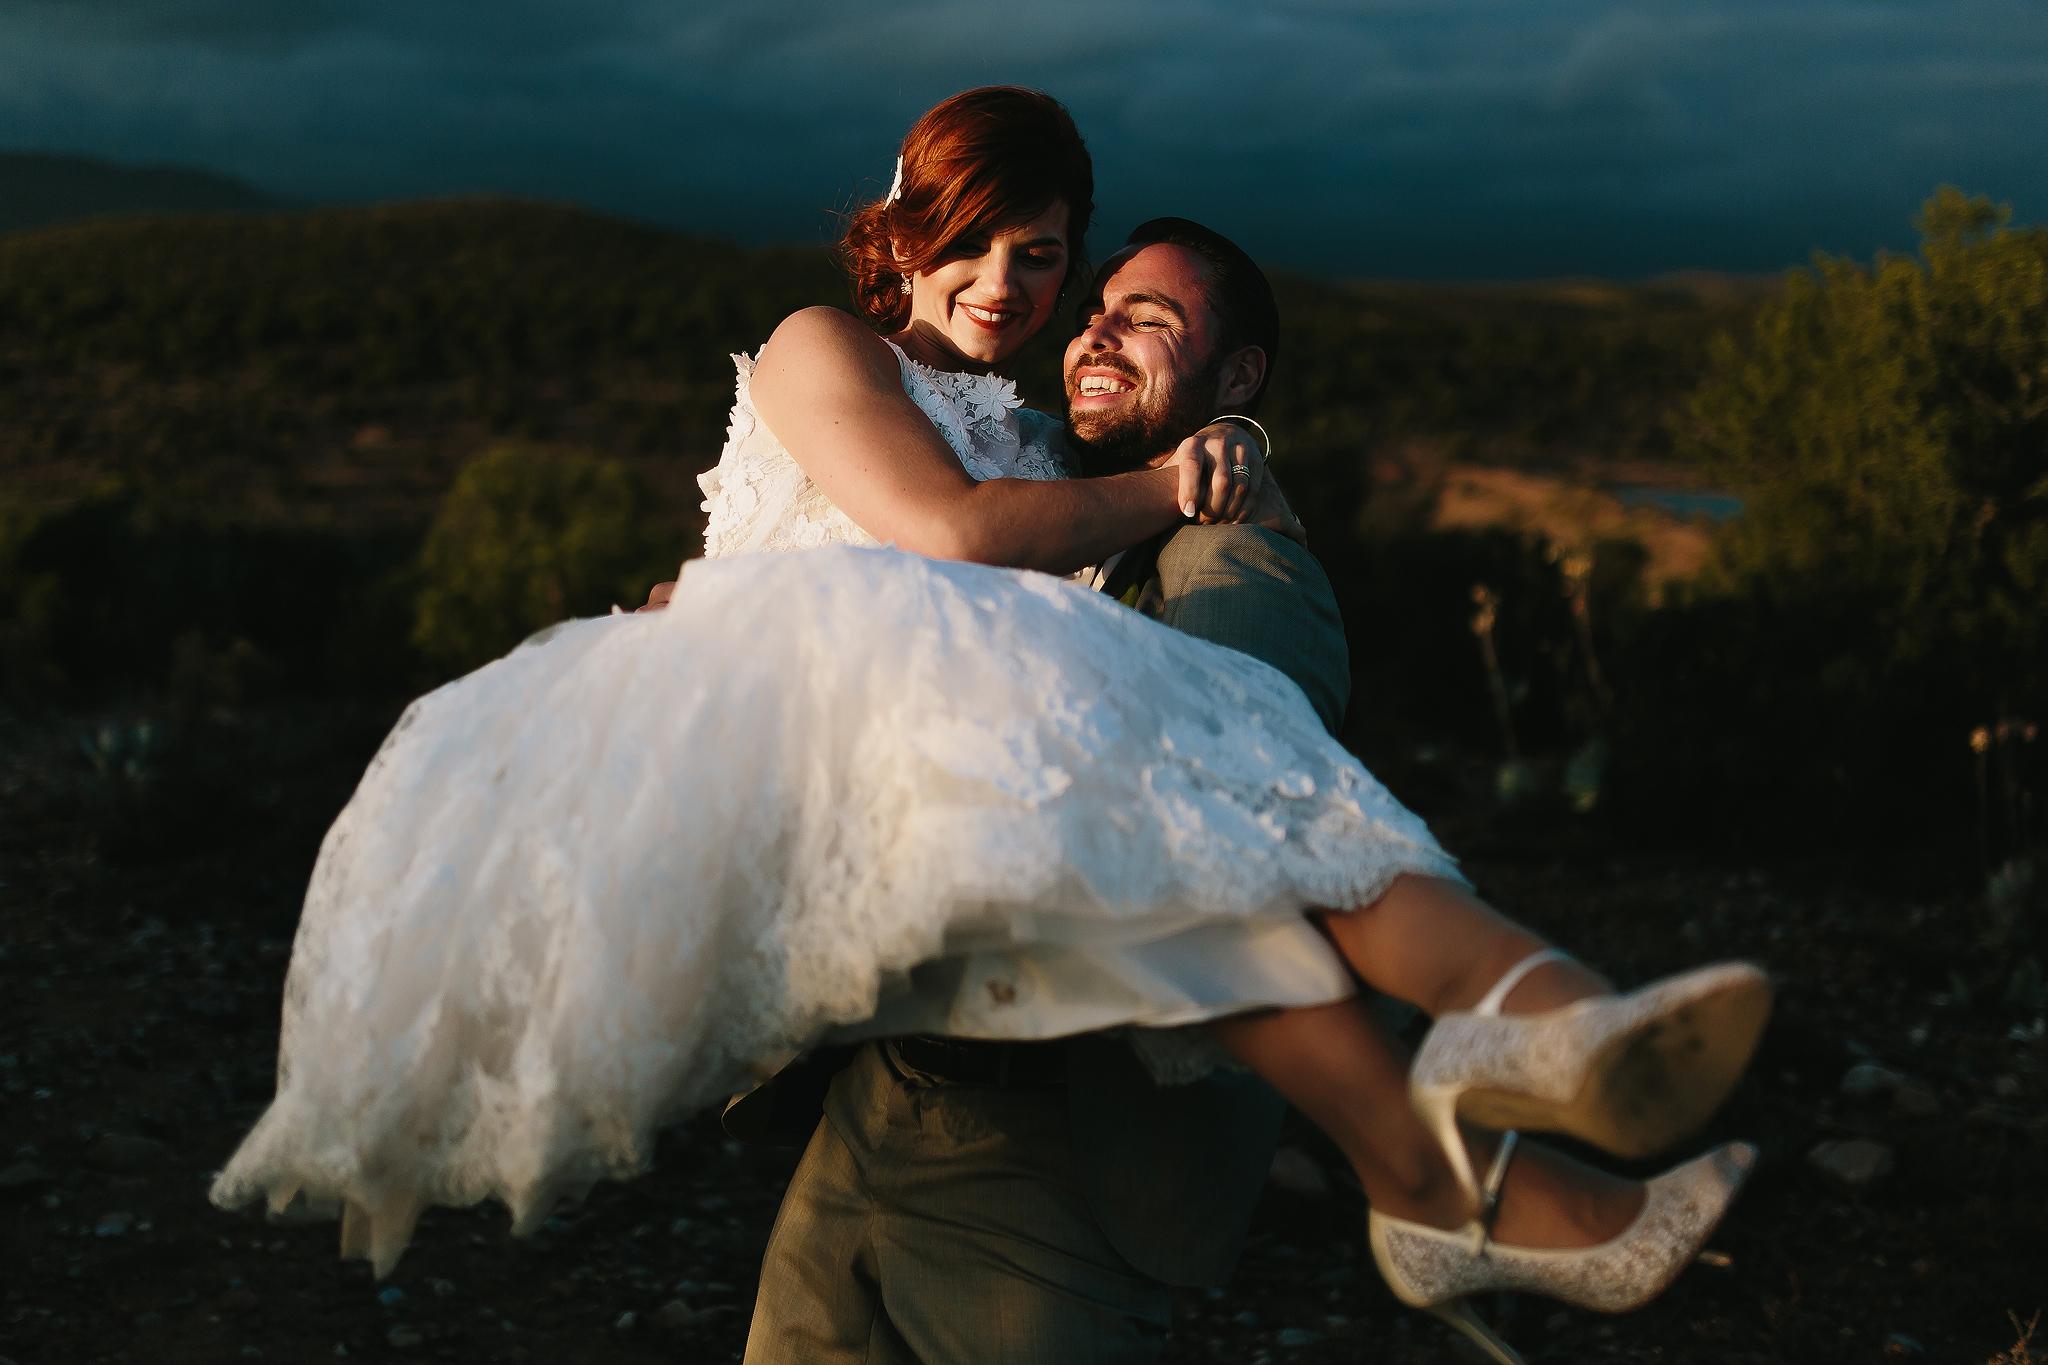 groom-carries-bride-outdoors-ruan-redelinghuys-photography